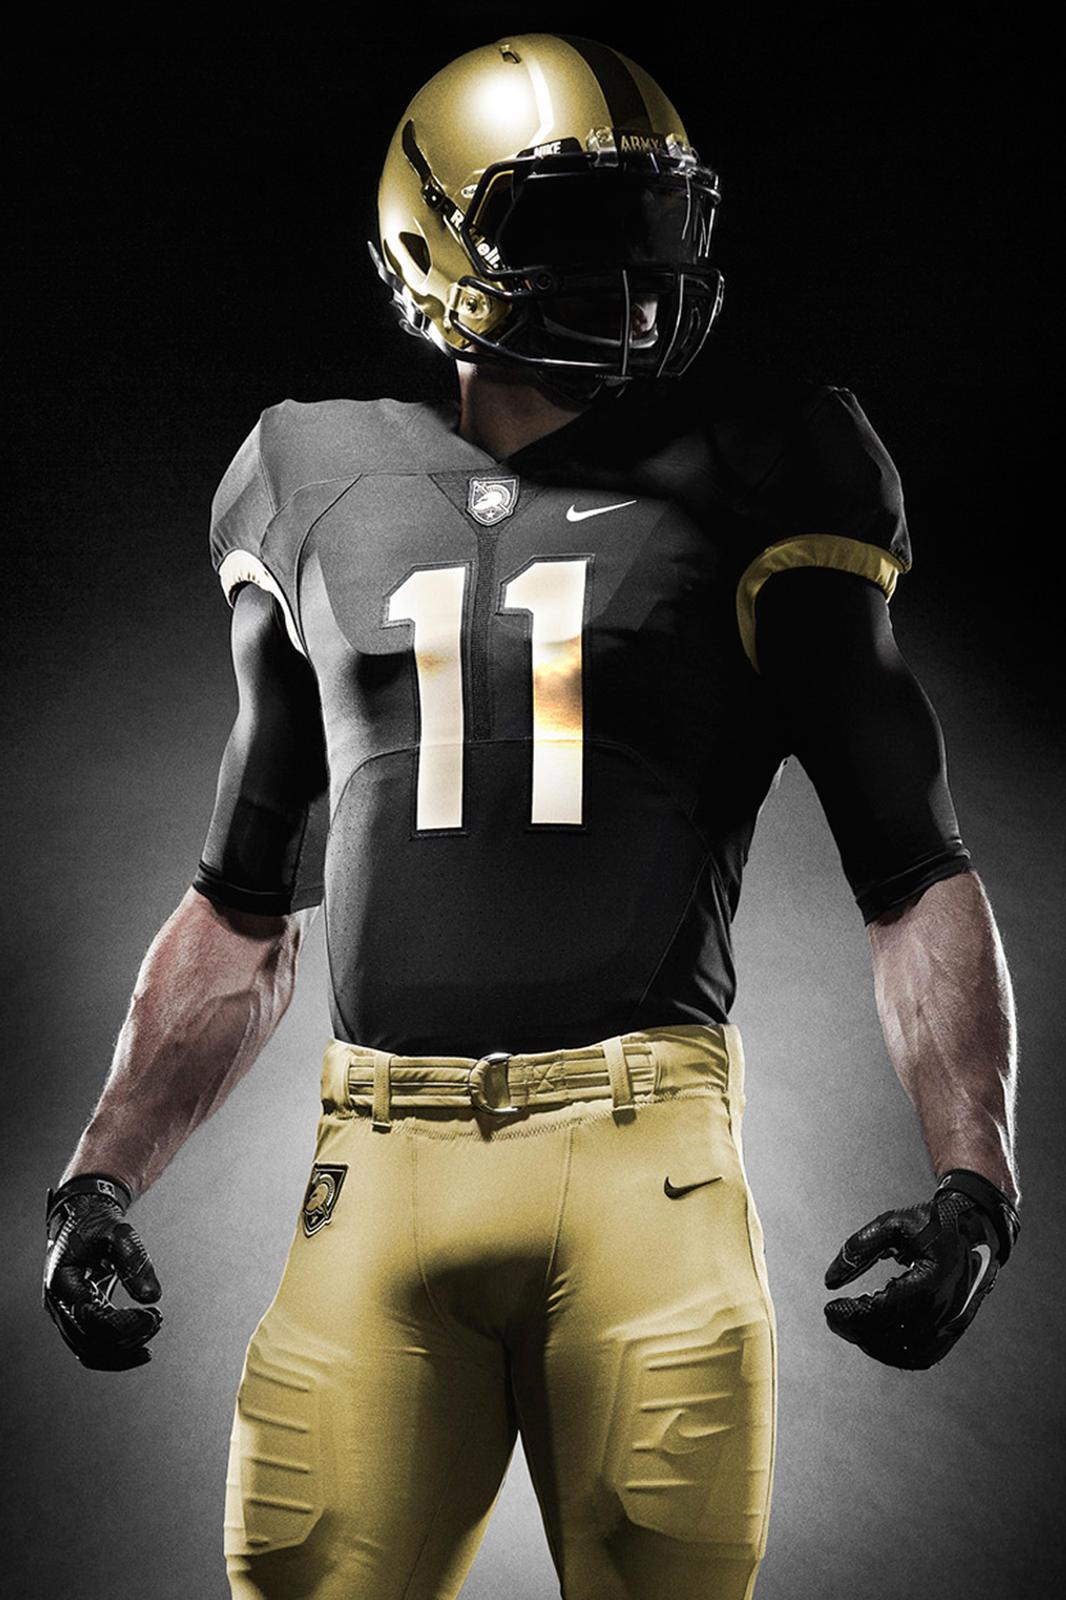 de94b9f7cdb Army West Point Evolves Its Brand Across All Athletics - Nike News